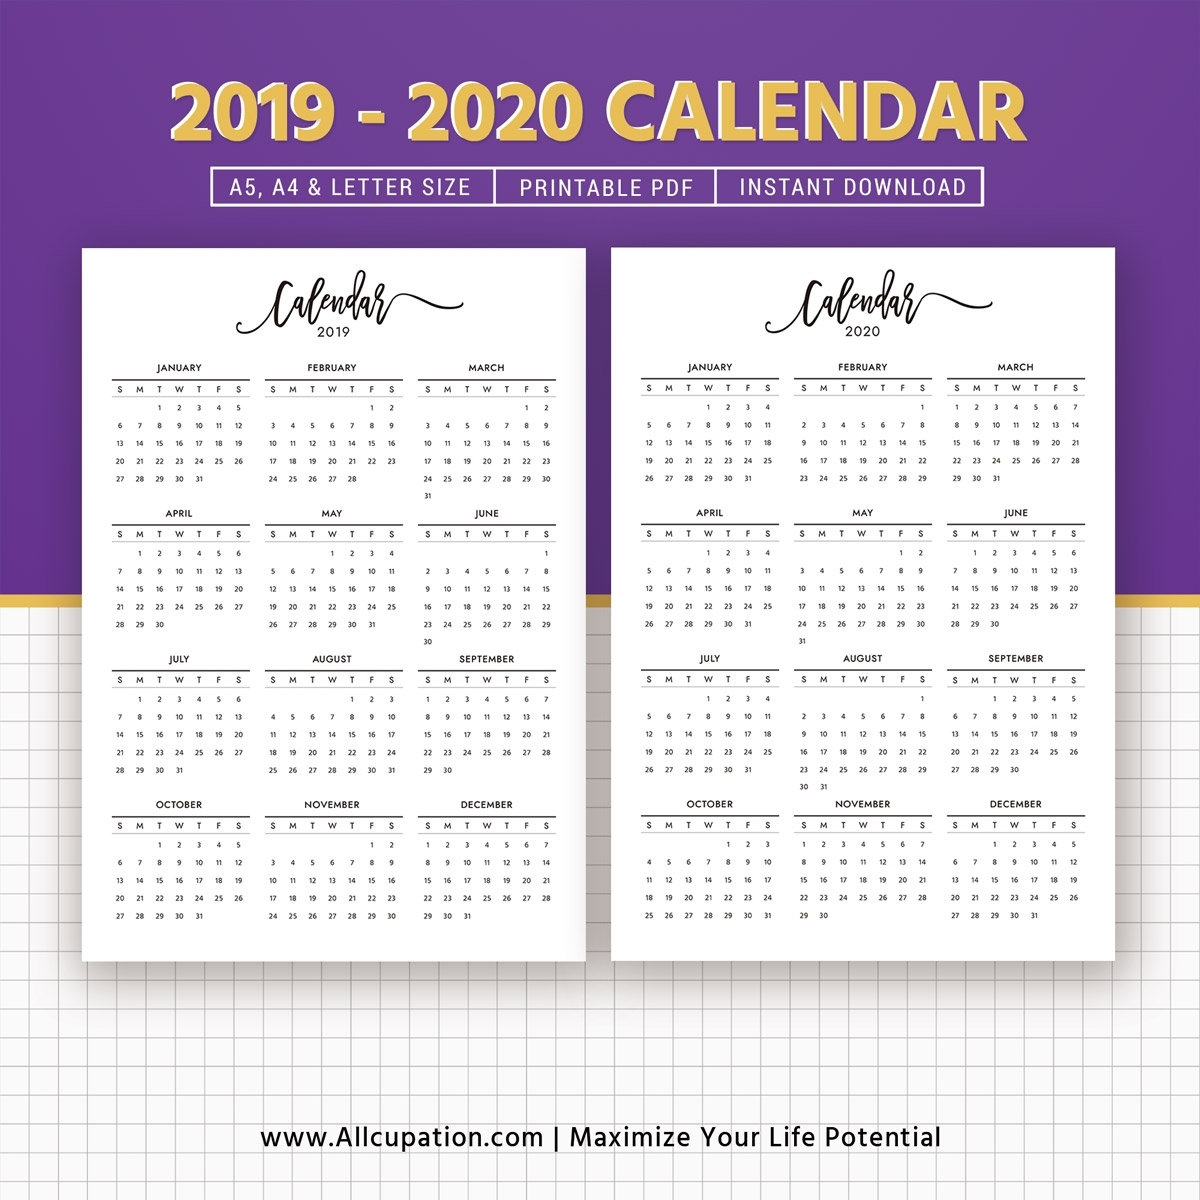 2019-2020 Calendar, Printable Calendar, Planner Design, Best Planner